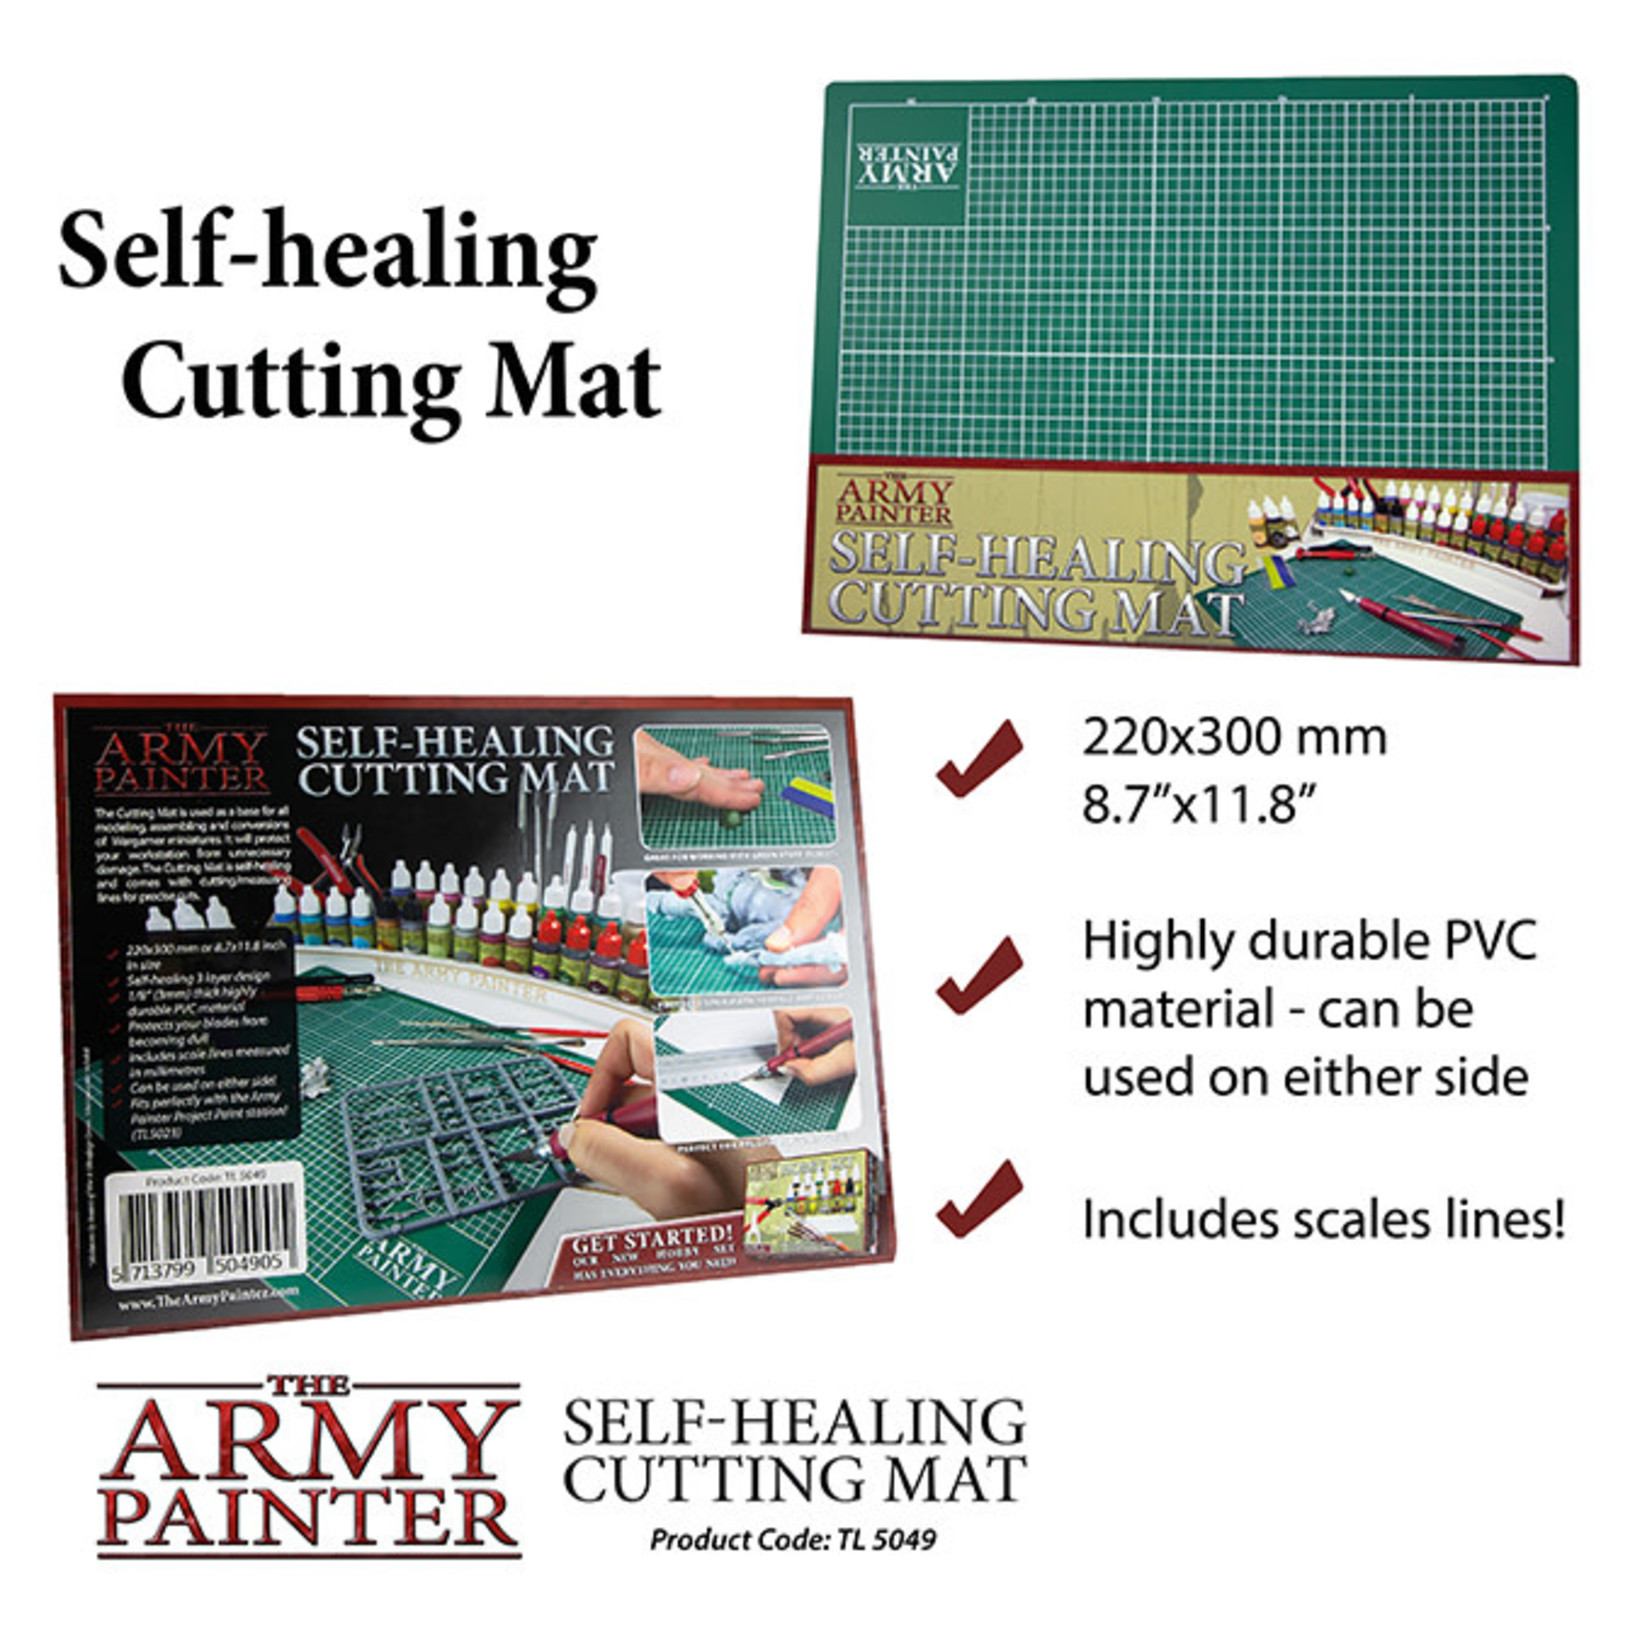 The Army Painter Self-healing Cutting Mat (2019)